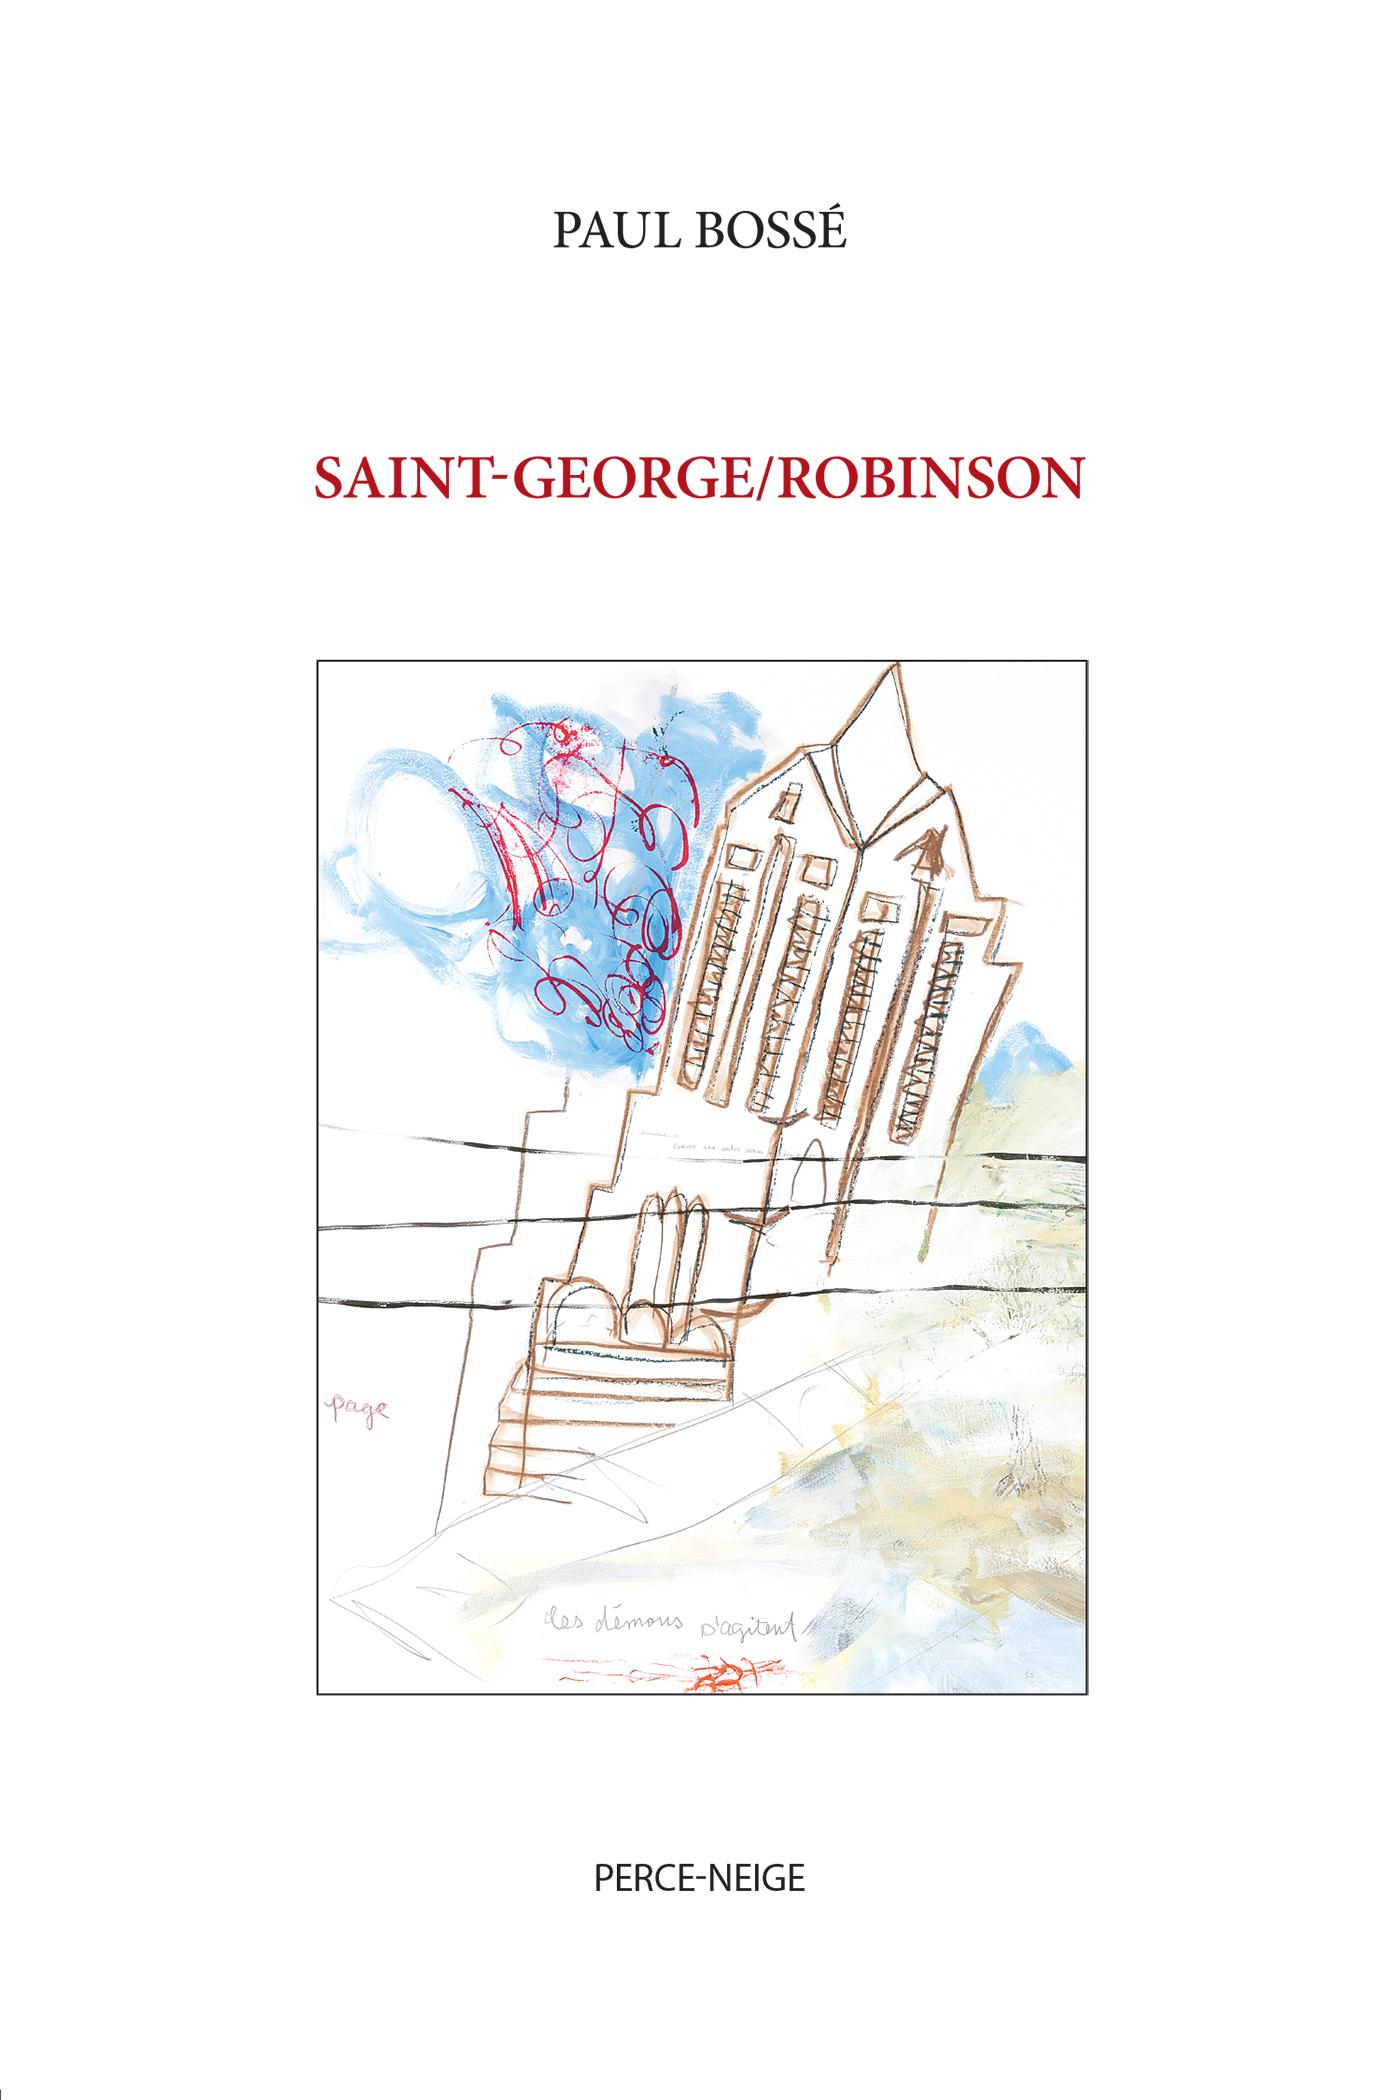 Saint-George/Robinson